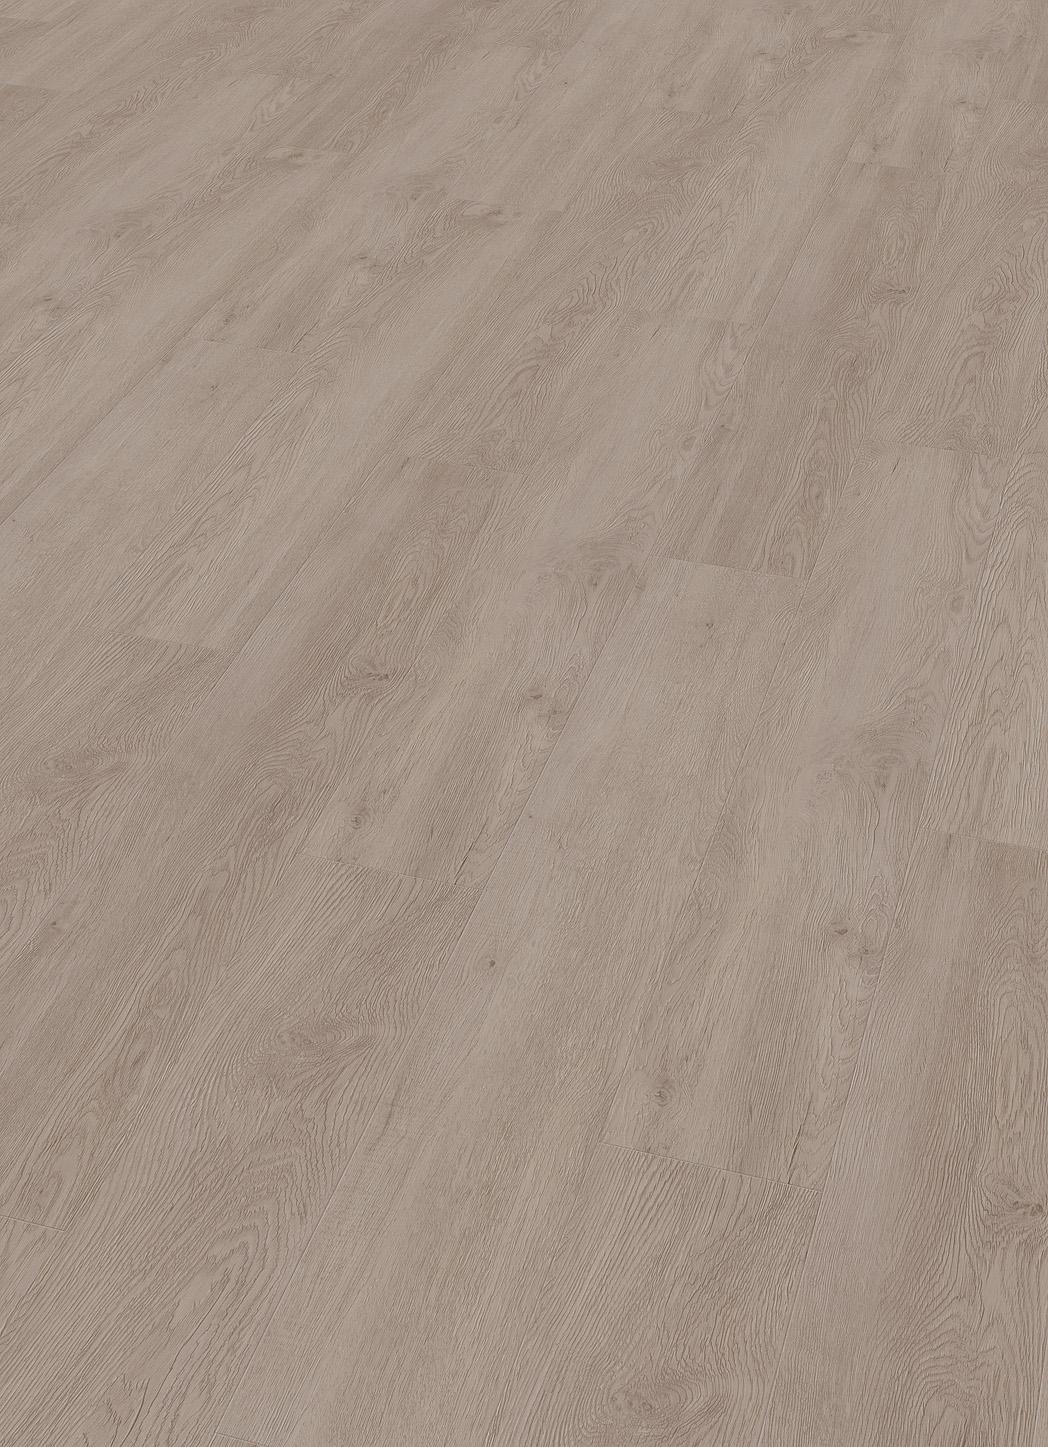 terh rne vinyl 9 mm klick eiche oslo braun inkl trittschall f07 pure choice. Black Bedroom Furniture Sets. Home Design Ideas